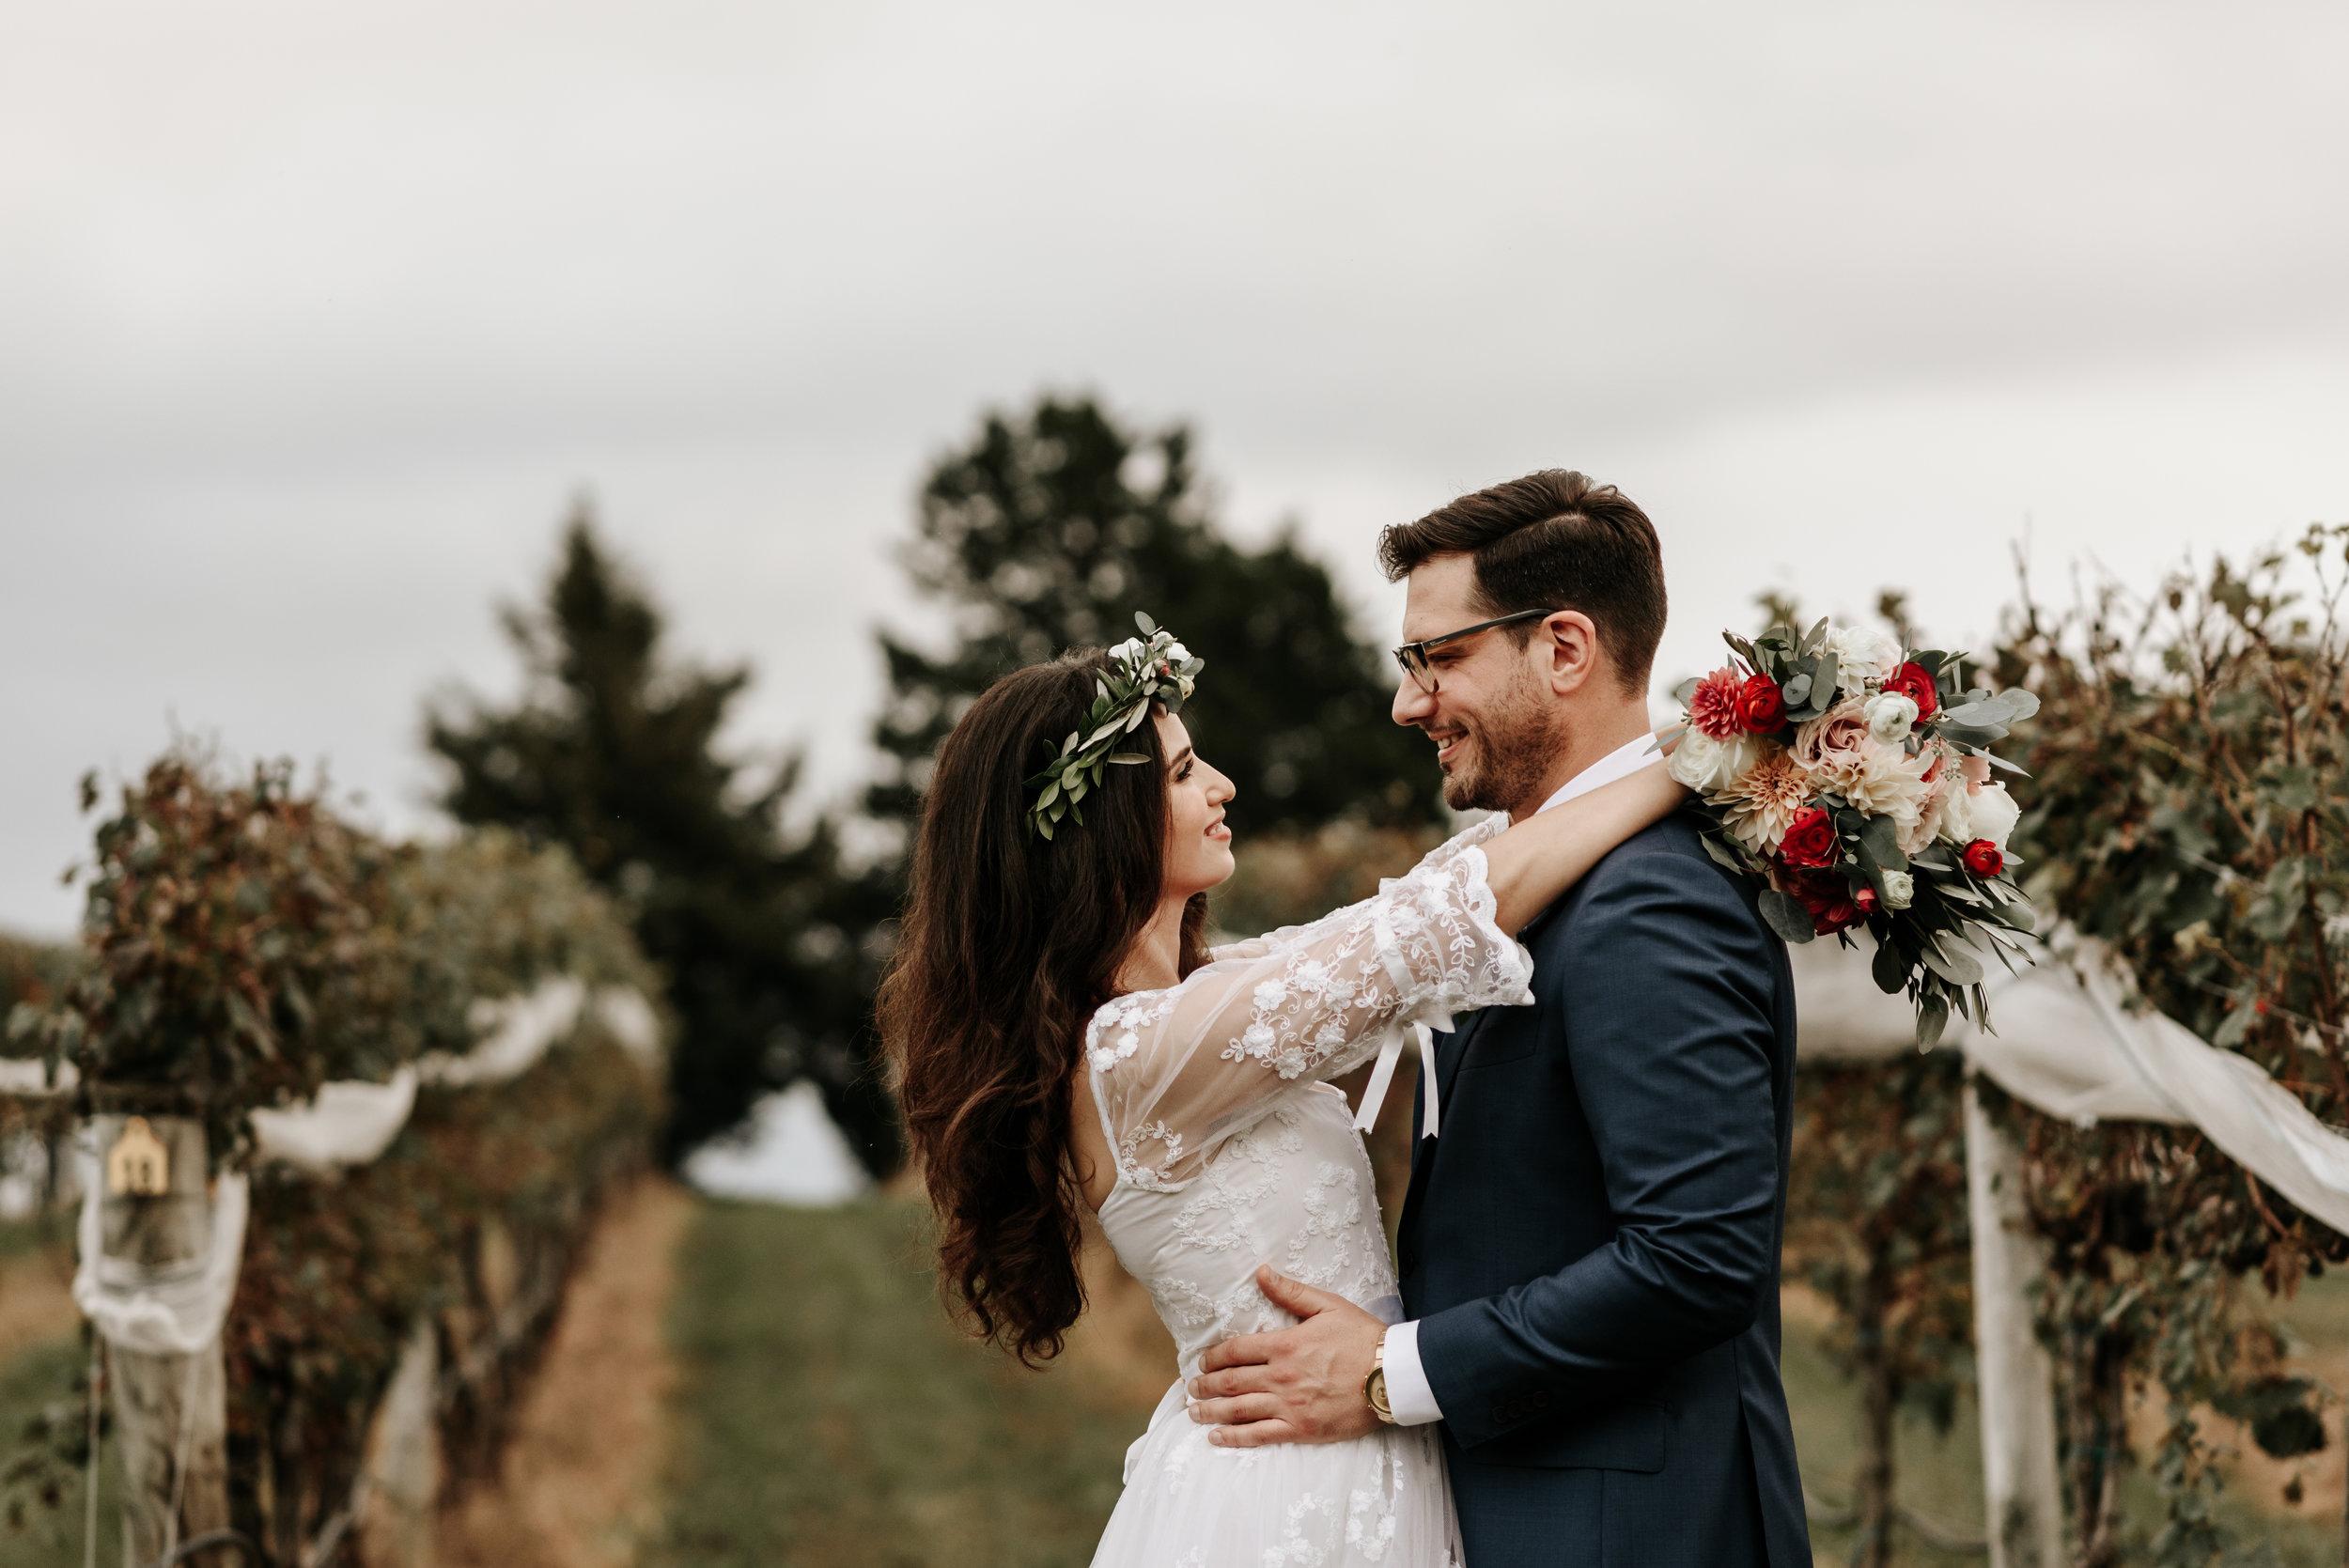 Veritas-Vineyards-and-Winery-Wedding-Photography-Afton-Virginia-Yasmin-Seth-Photography-by-V-2637.jpg